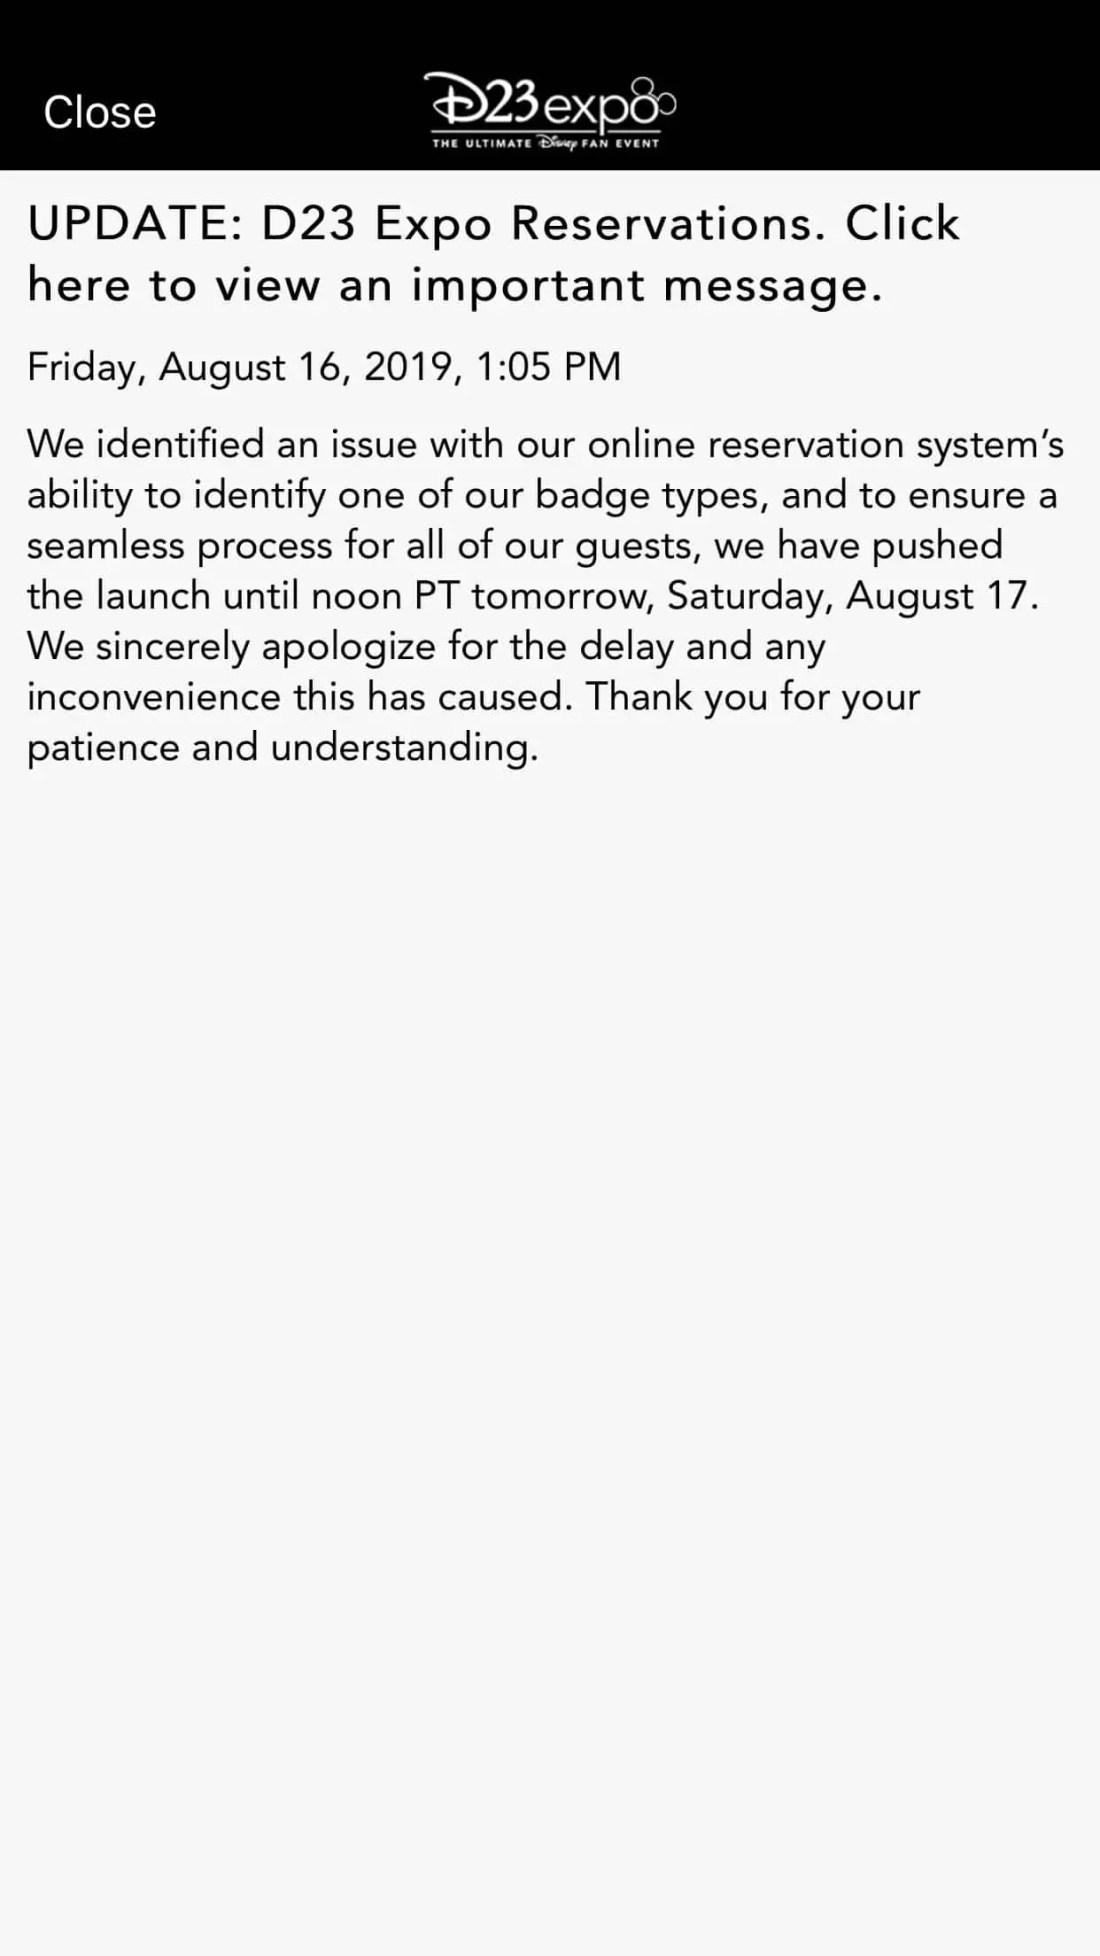 D23 Expo Reservations Announcement Via D23 Expo App